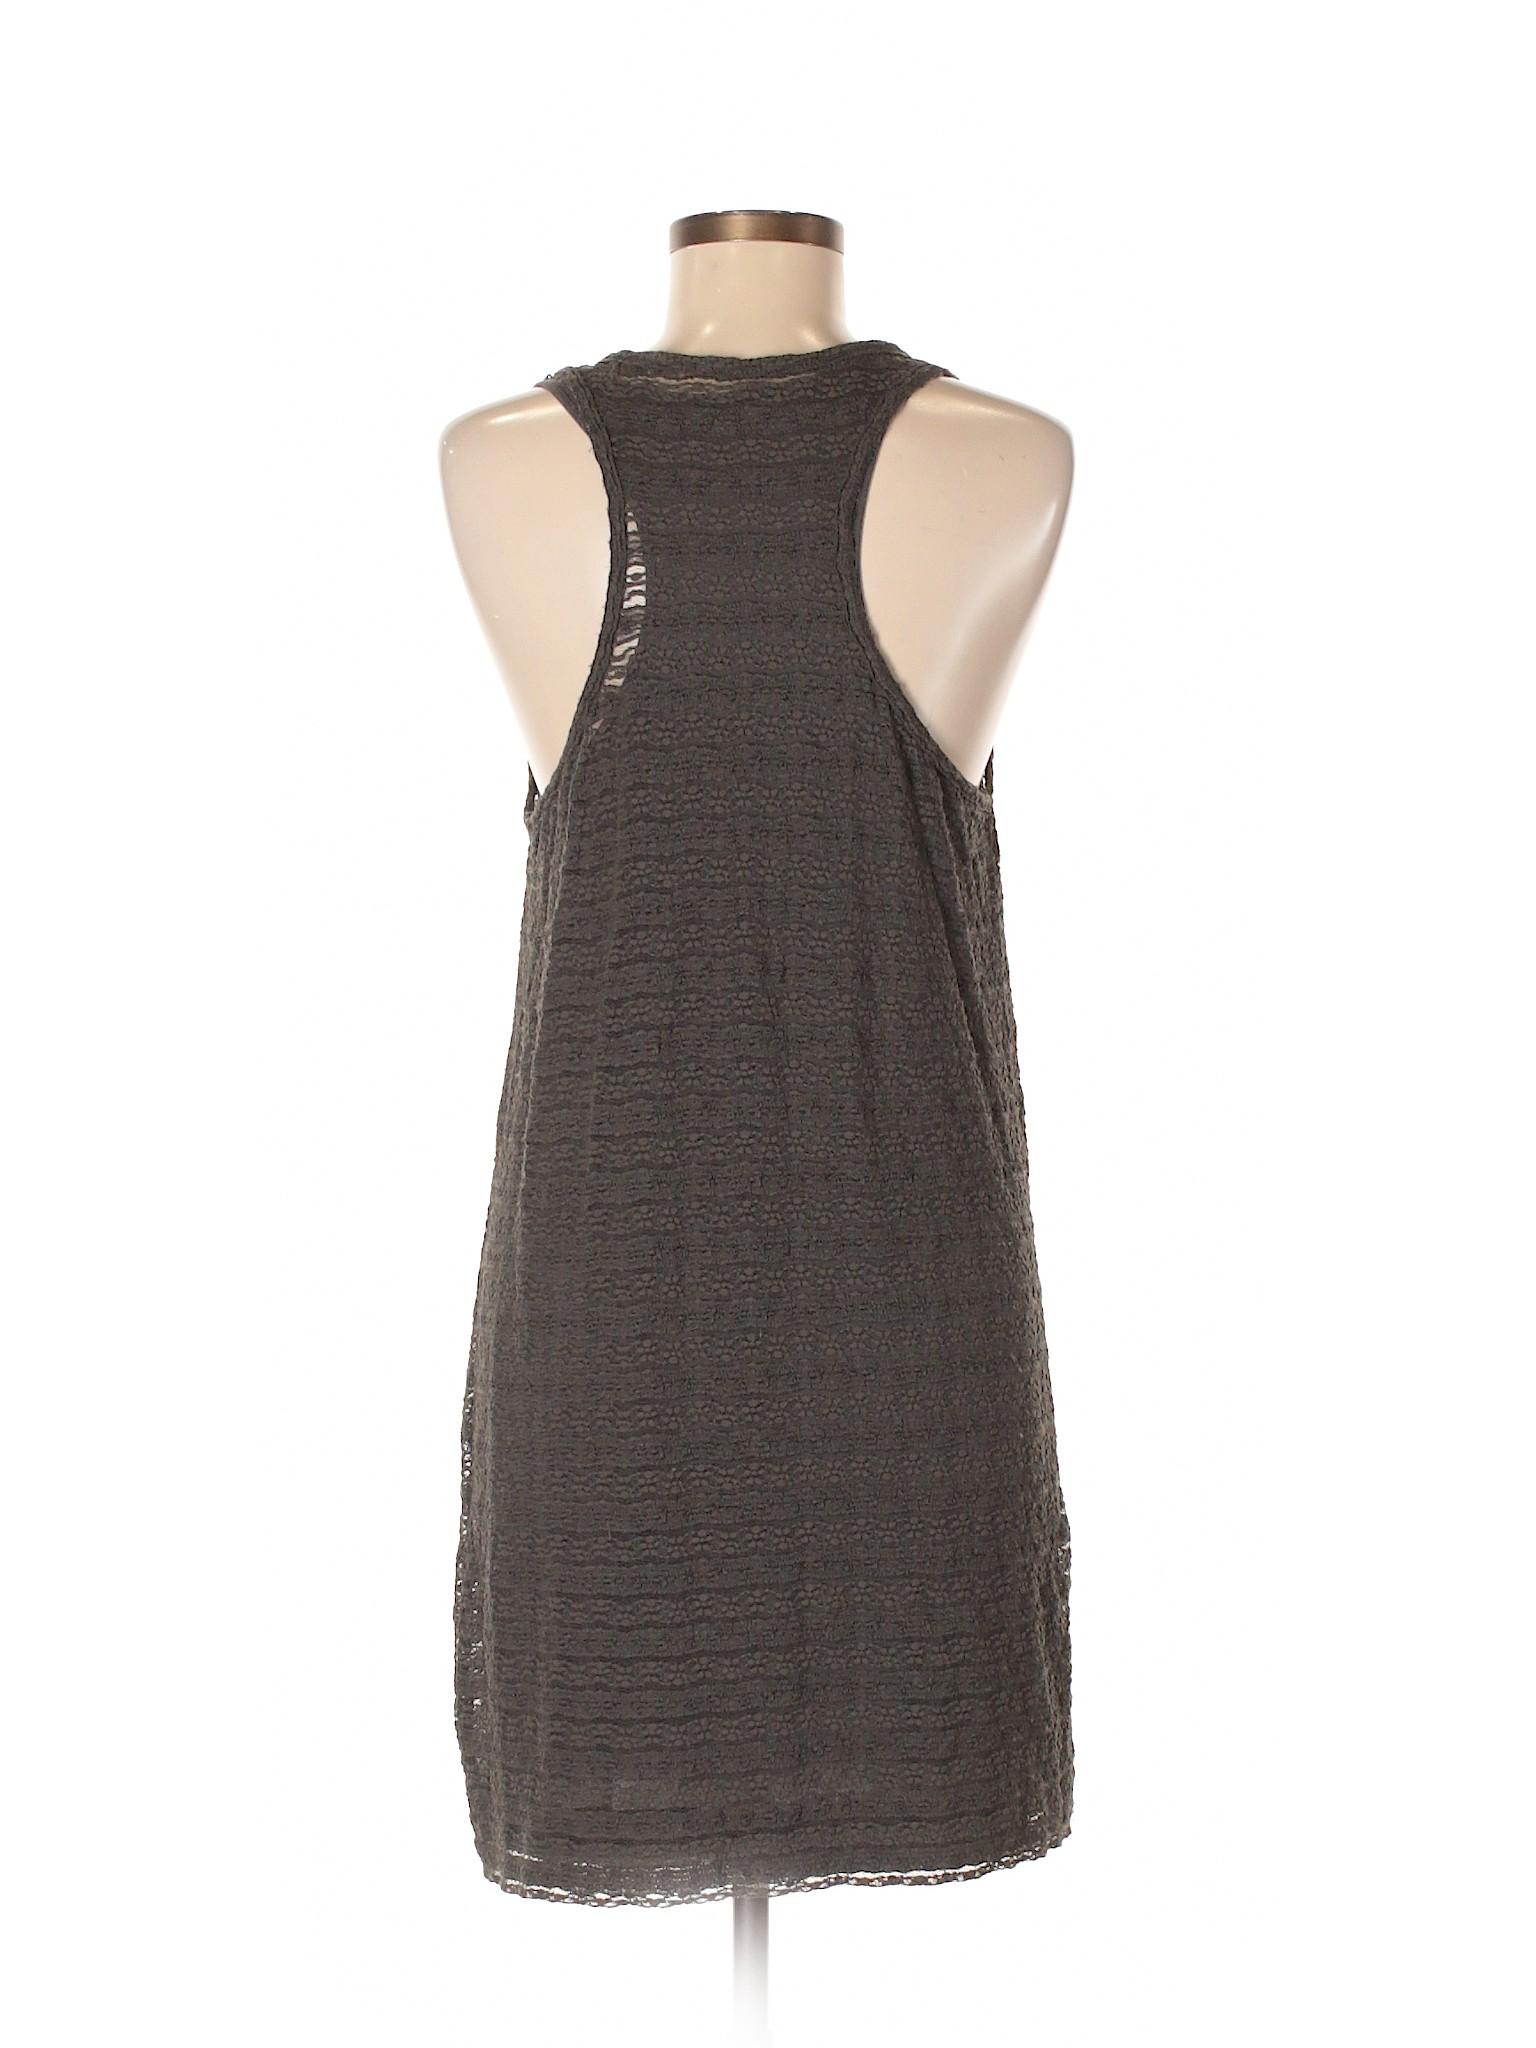 Dress Casual Store Selling J Factory Crew wXSSxqZIO